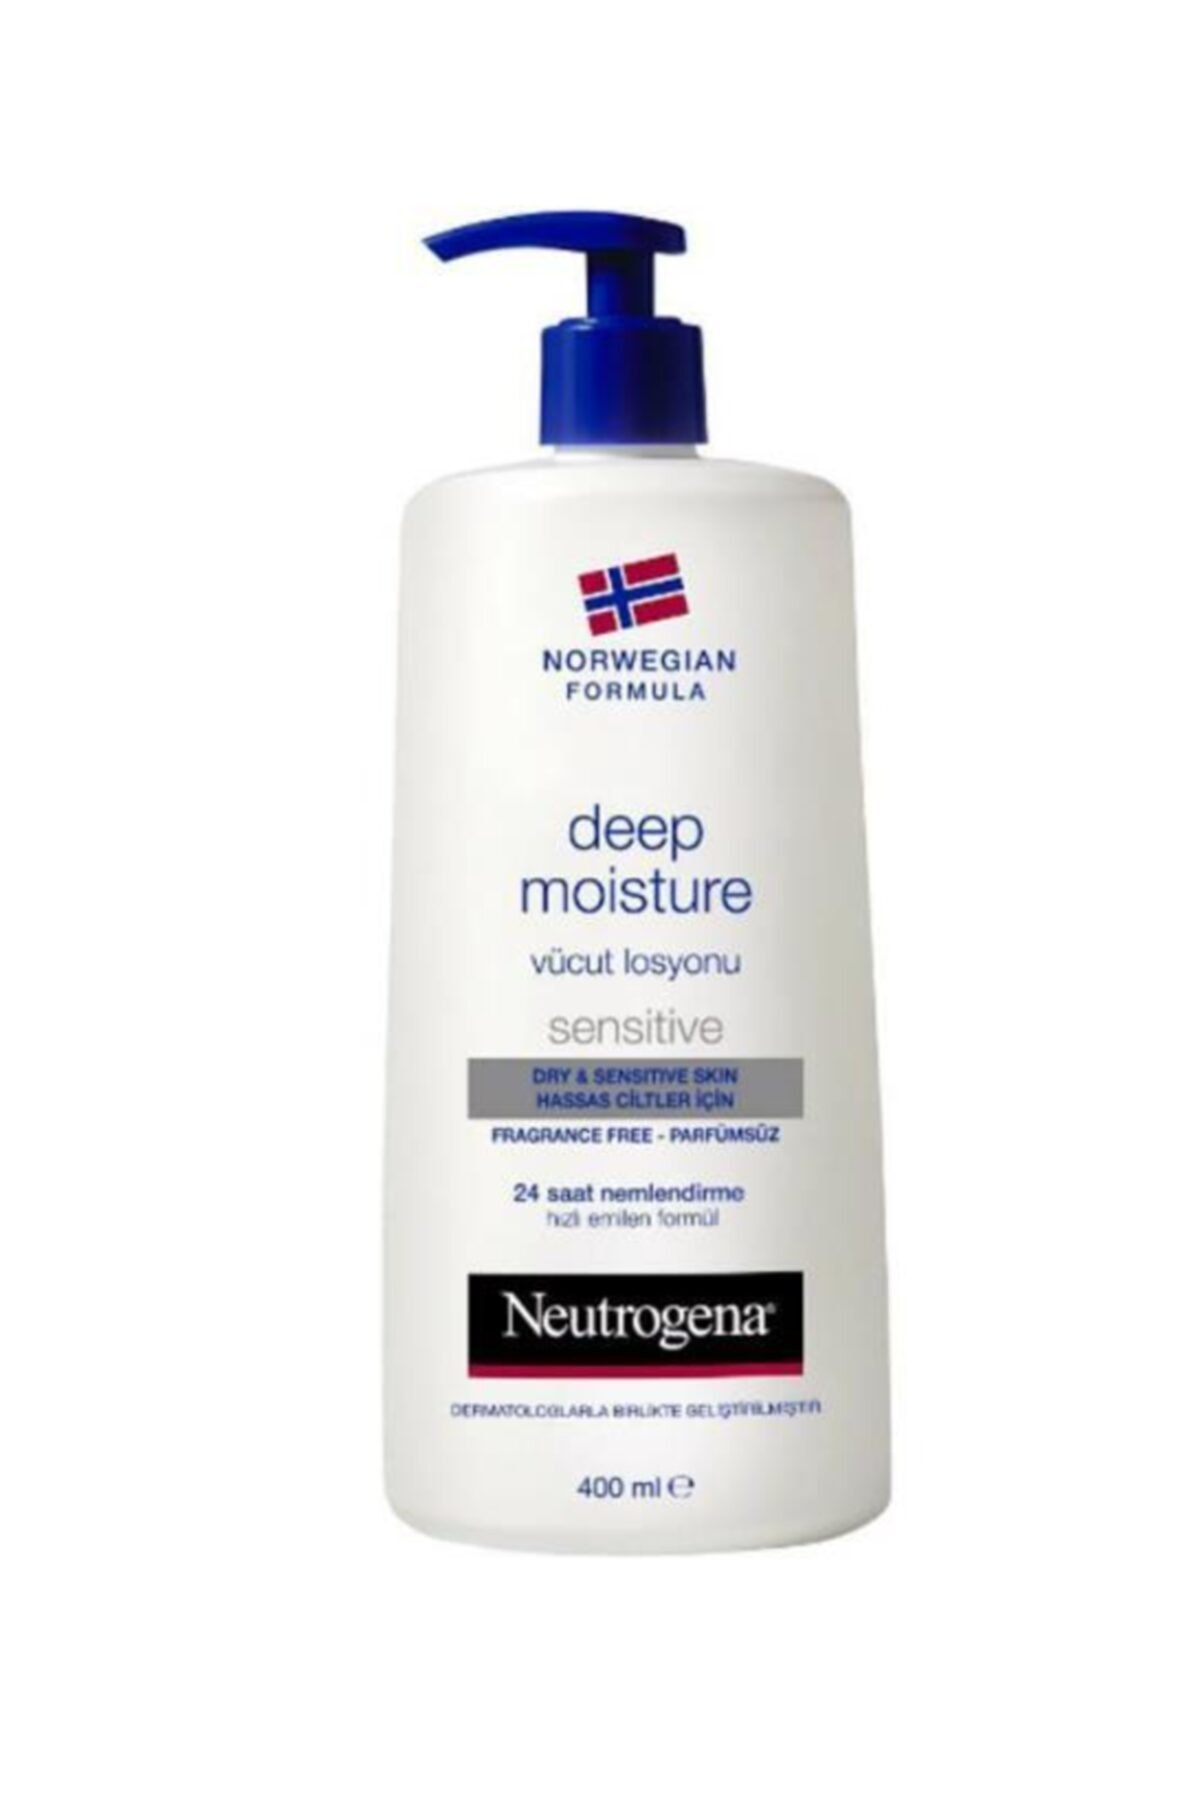 Neutrogena Hassas Ciltler İçin Parfümsüz Vücut Losyonu  - Deep Moisture 400 ml 3574661018201 1